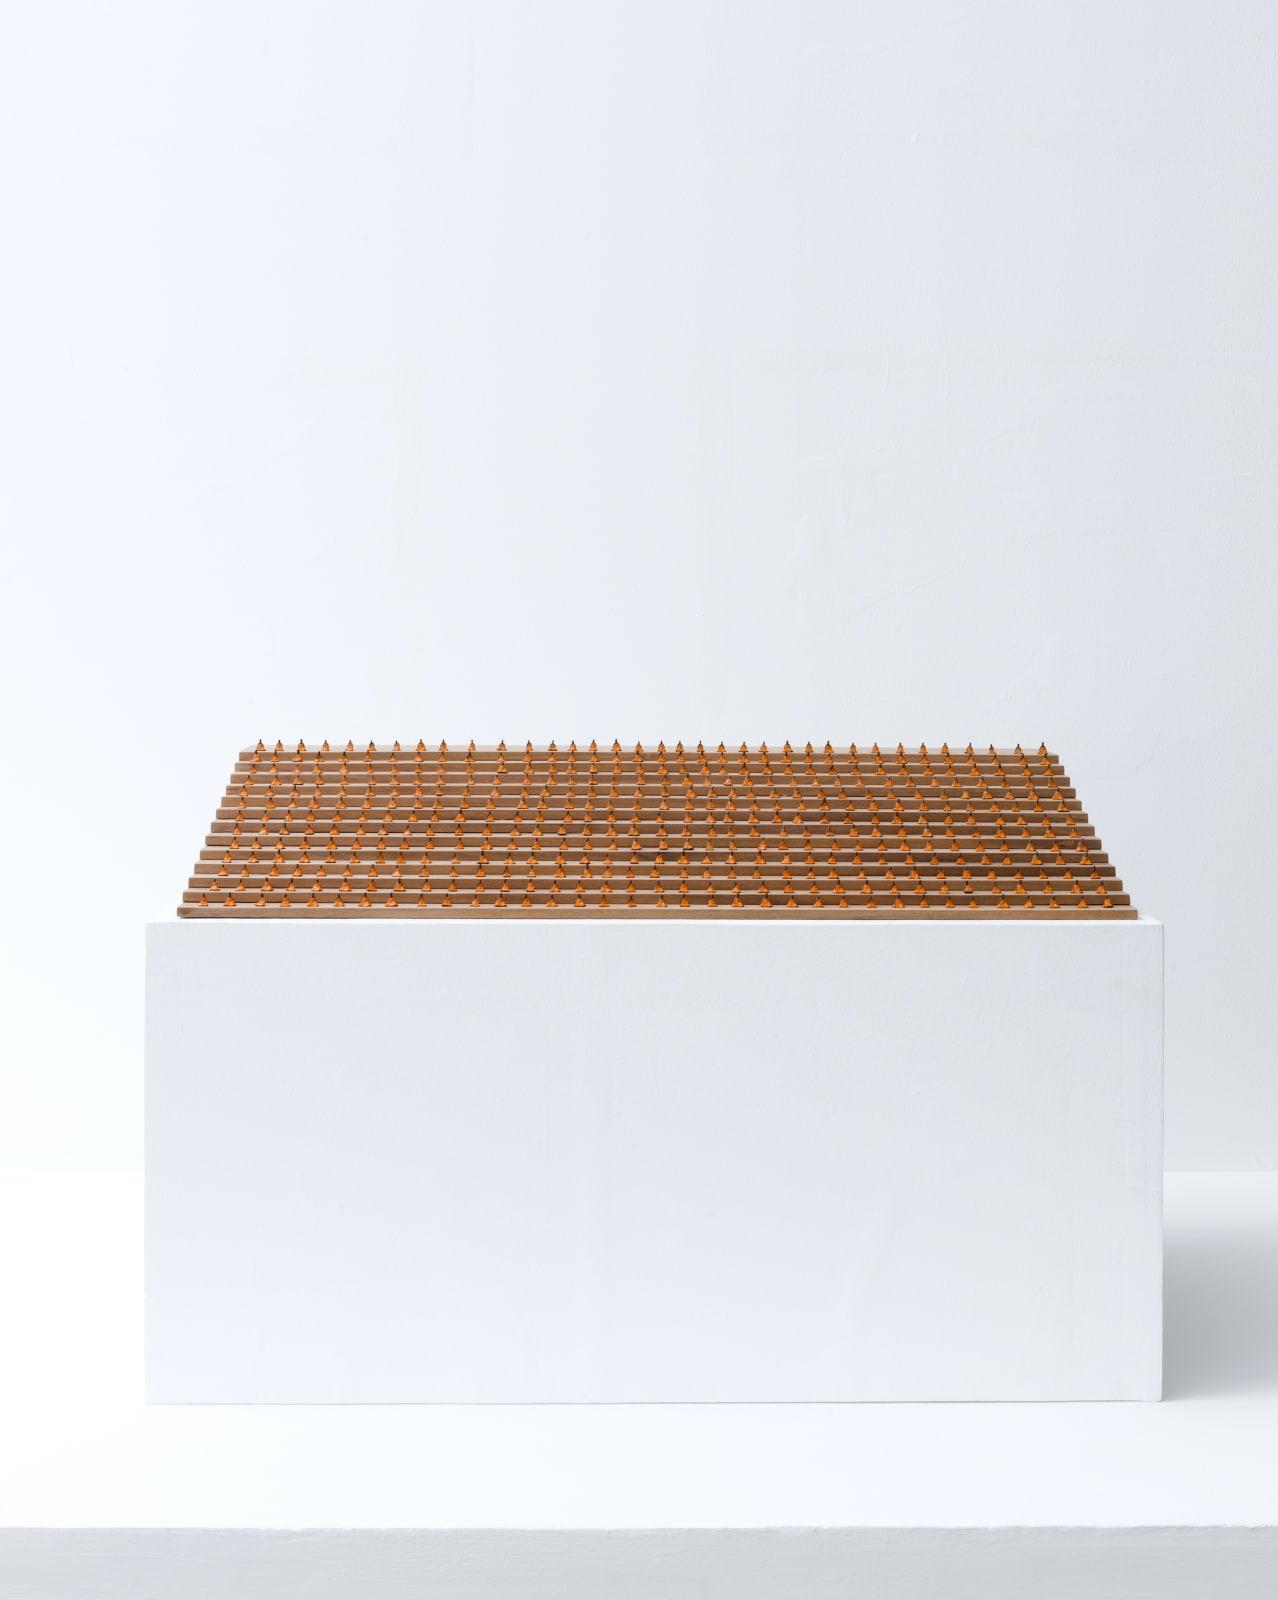 Sitting Monks, 2018, Yakal wood, plastic, and acrylic, 13 x 91.5 x 51 cm